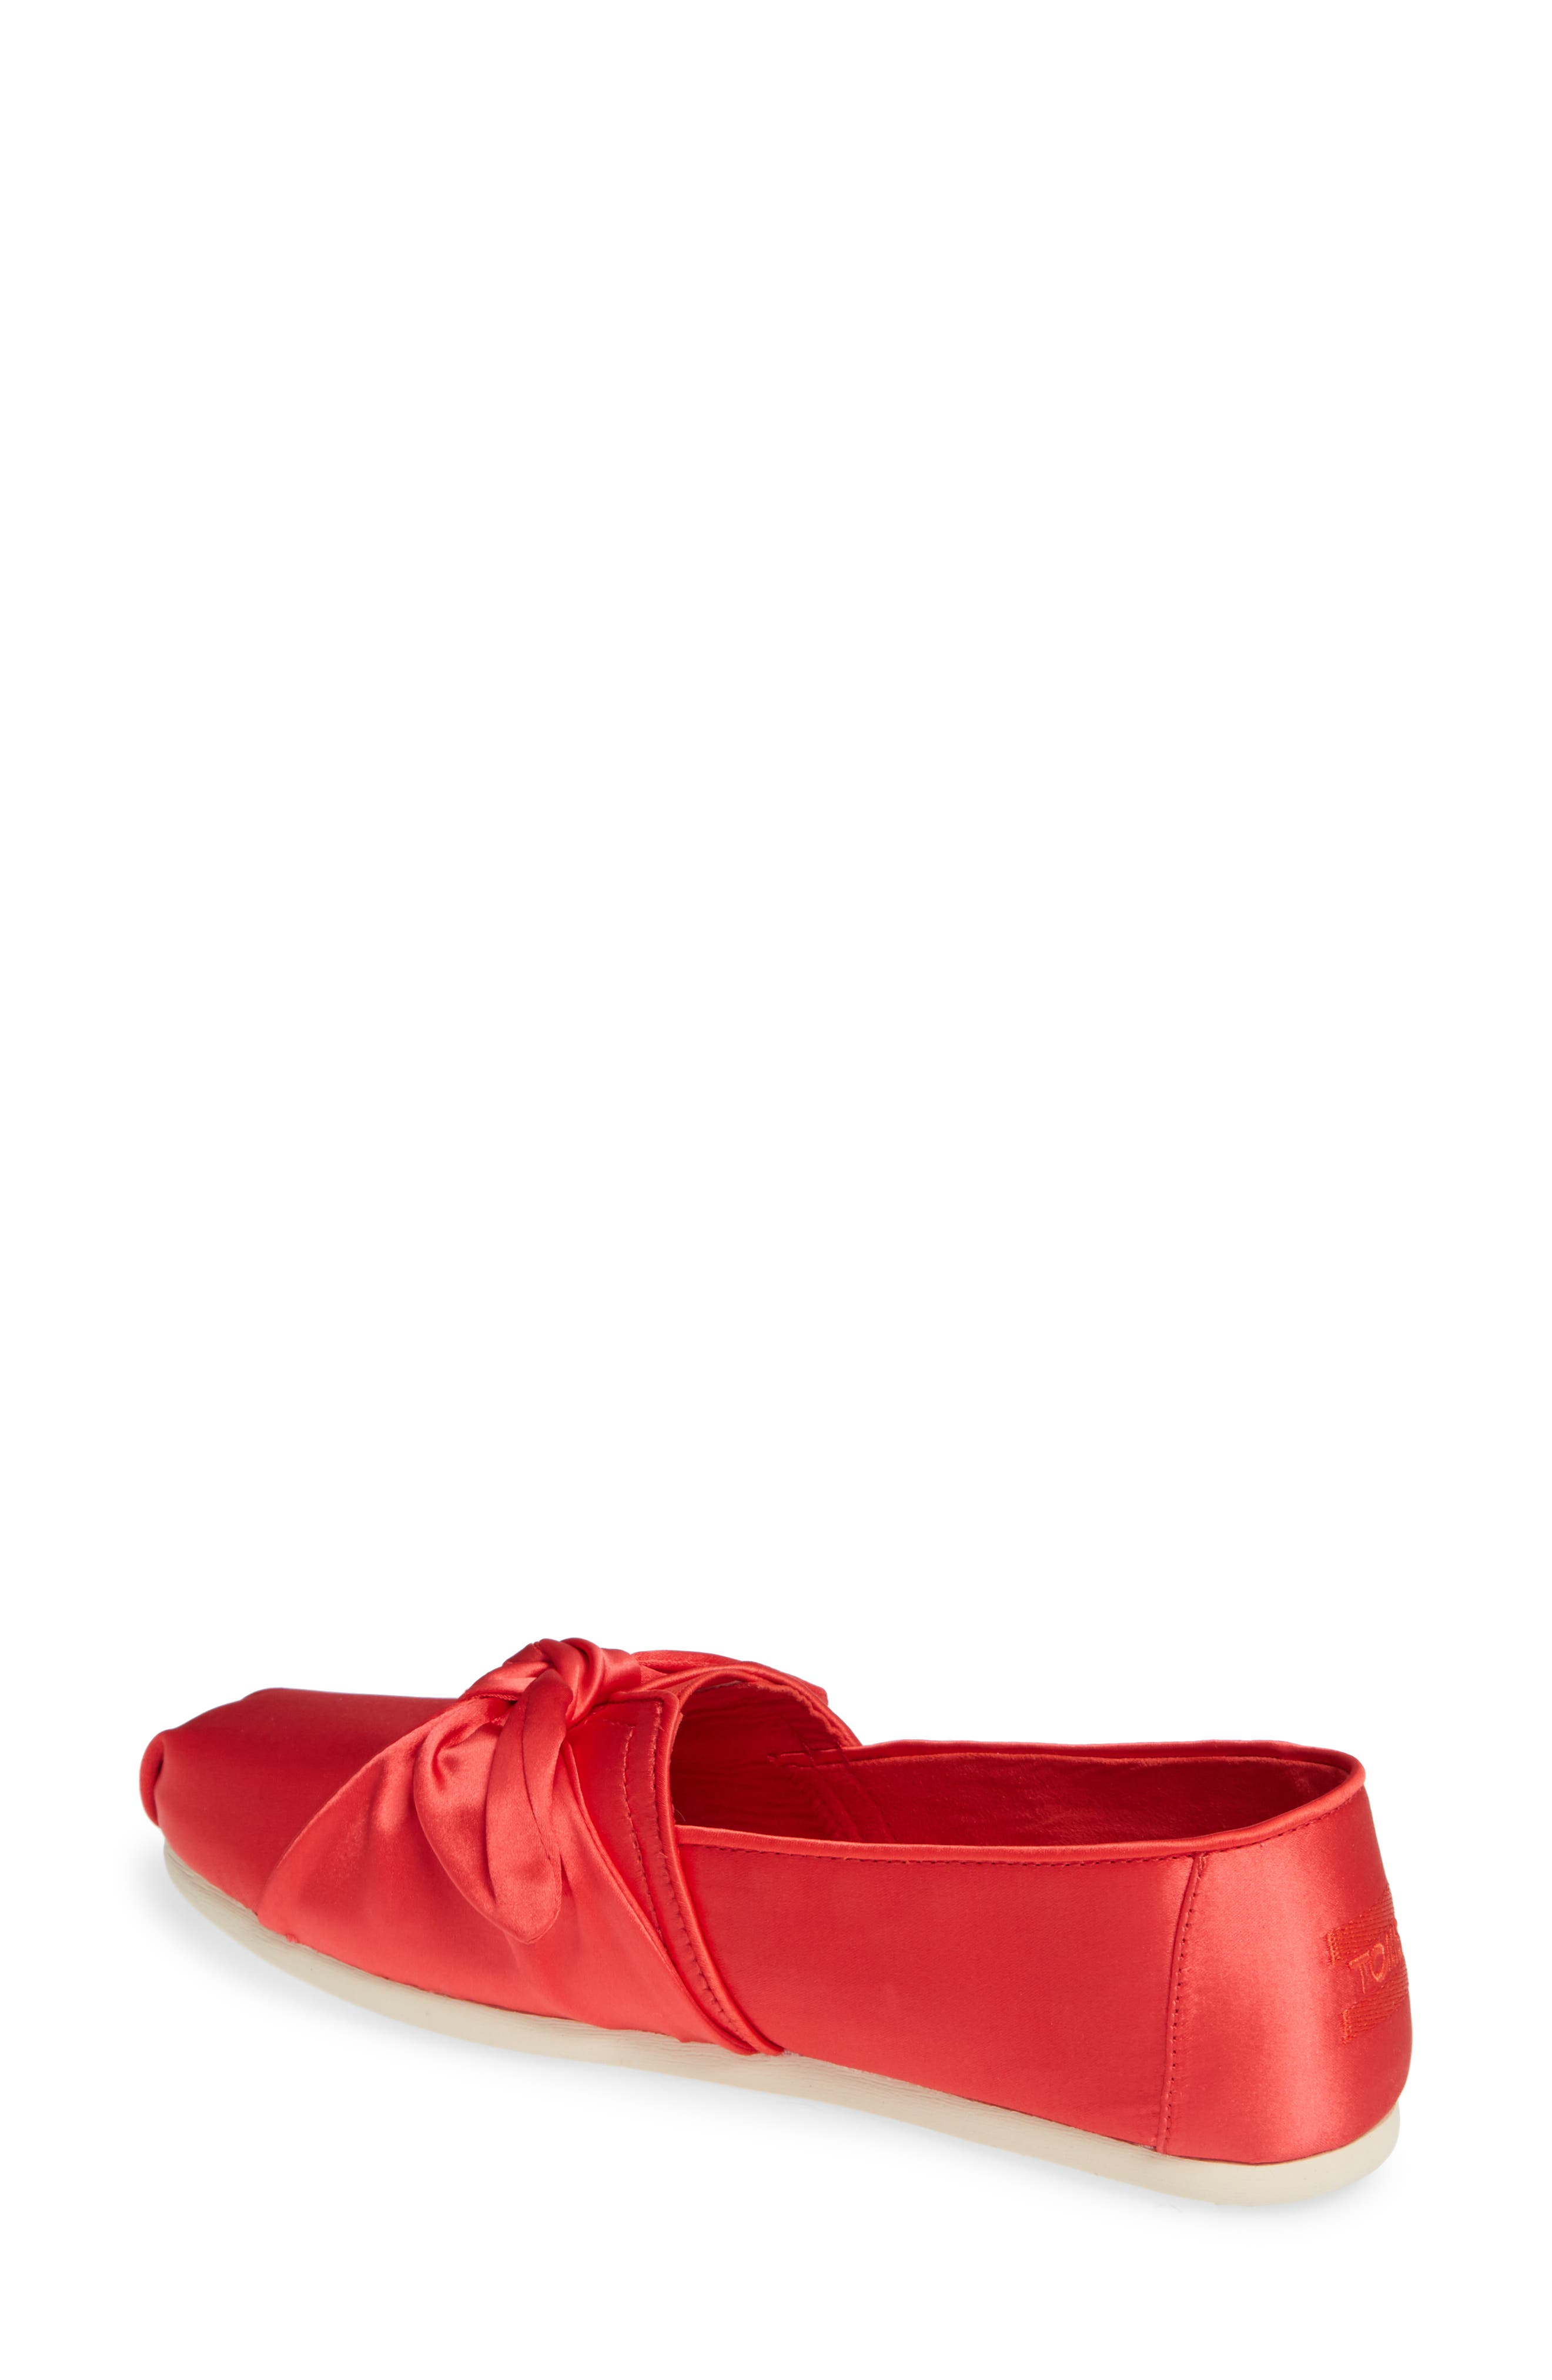 TOMS, Alpargata Bow Slip-On, Alternate thumbnail 2, color, RED LAVA FABRIC